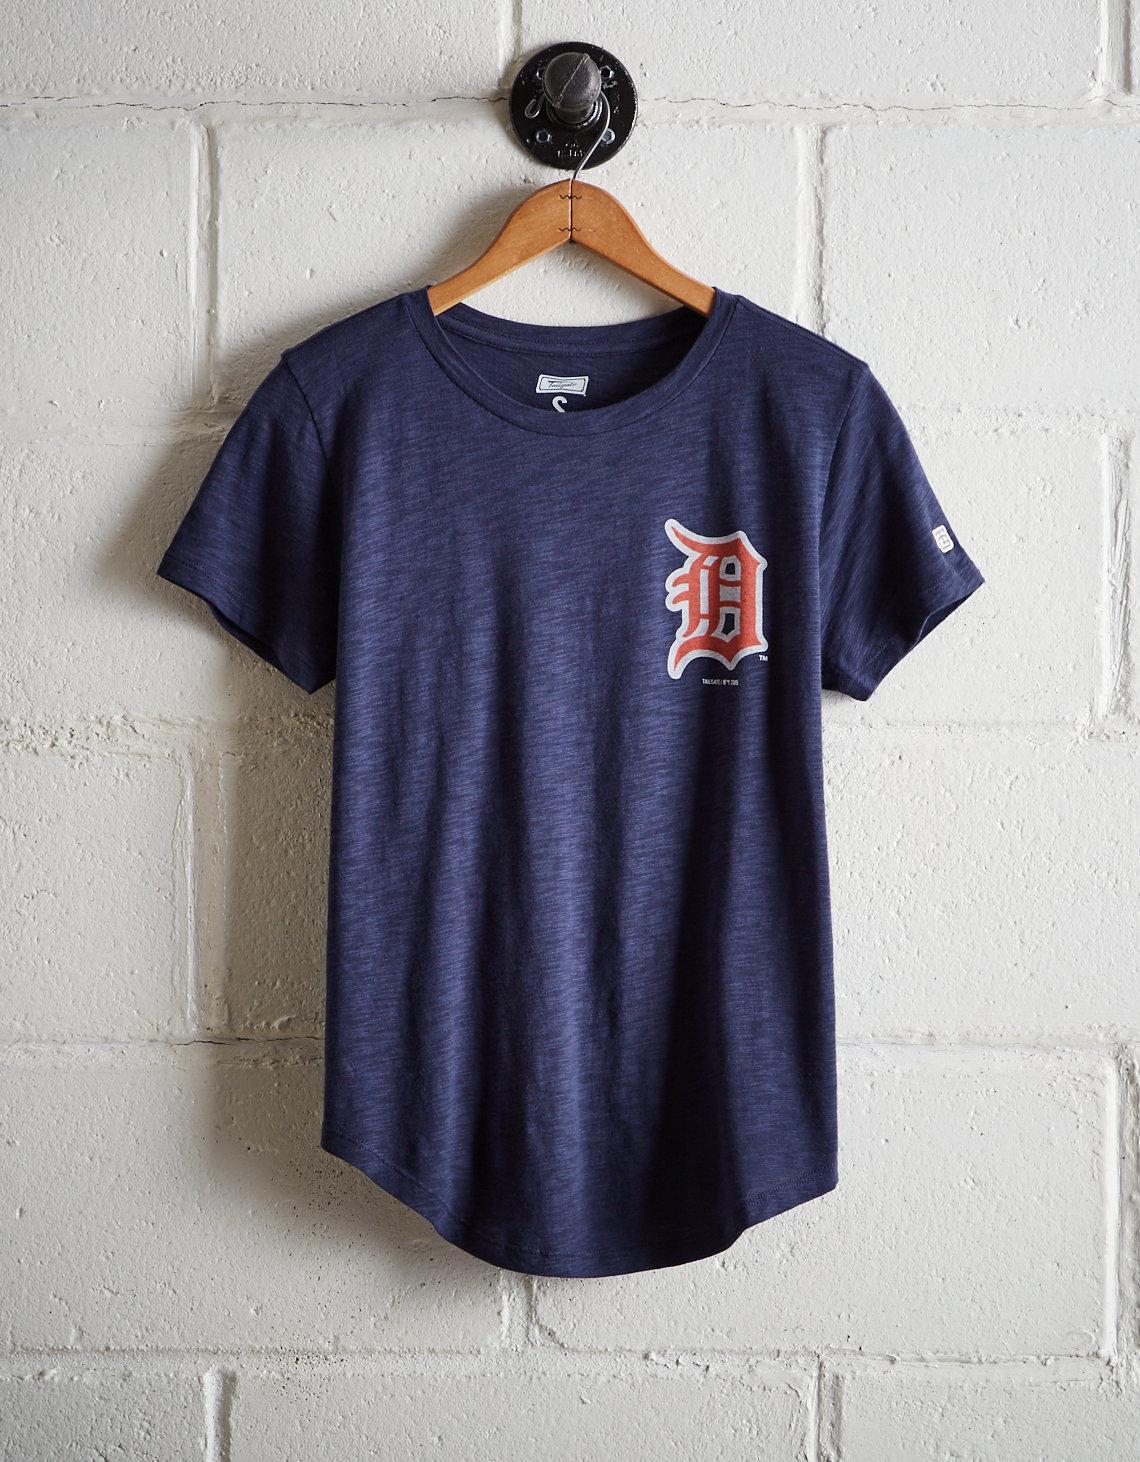 c43ce09b Tailgate Women's Detroit Tigers T-Shirt. Placeholder image. Product Image